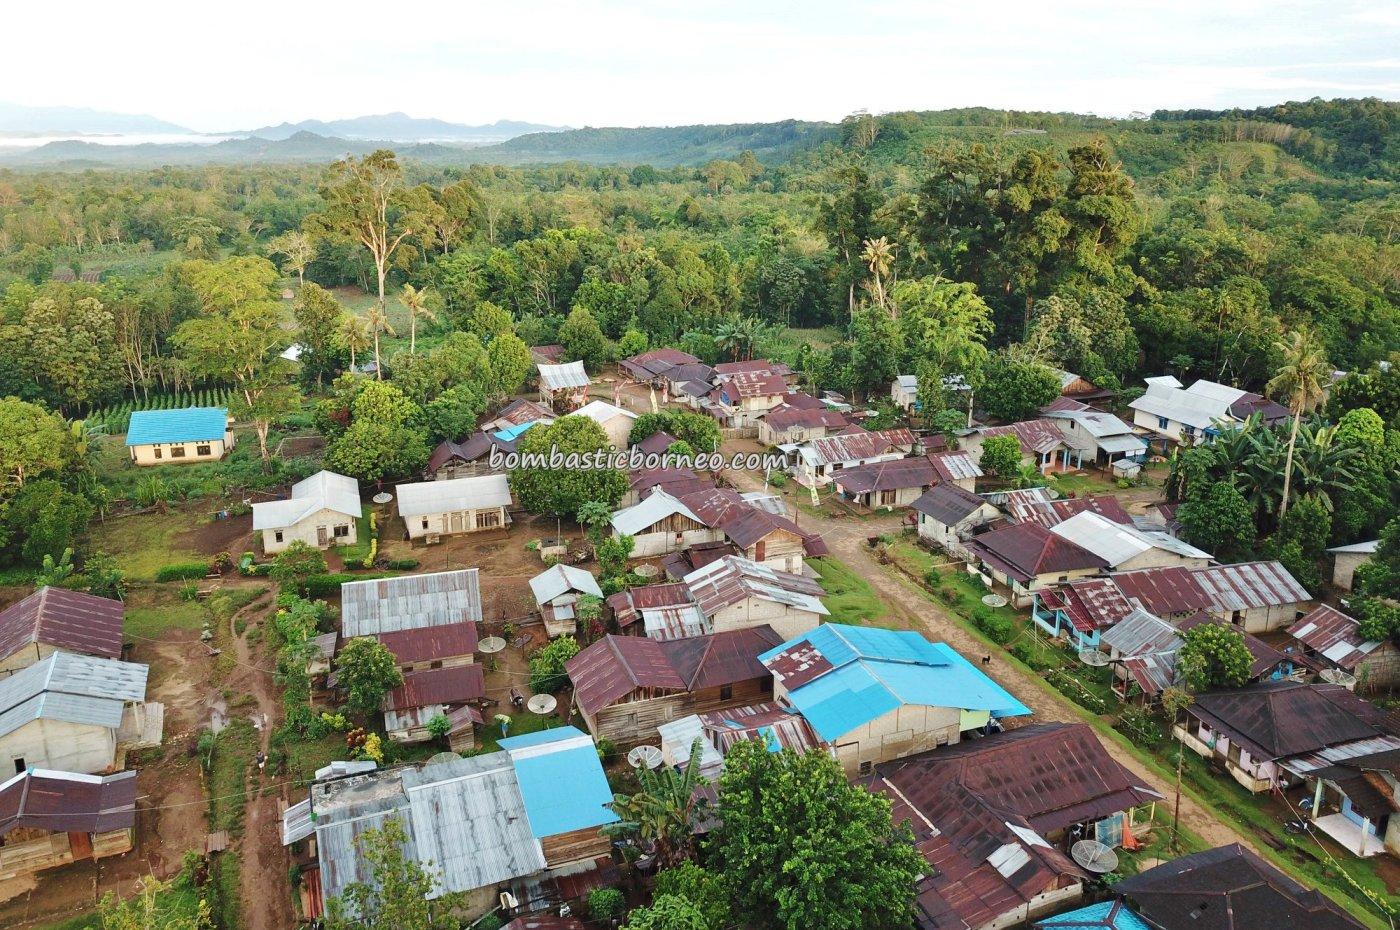 traditional, authentic, destination, Borneo, Bengkayang, West Kalimantan, Indonesia, Dusun Laek, Desa Bengkilu, Tujuh Belas, native, village, Tourism, travel guide, transborder,